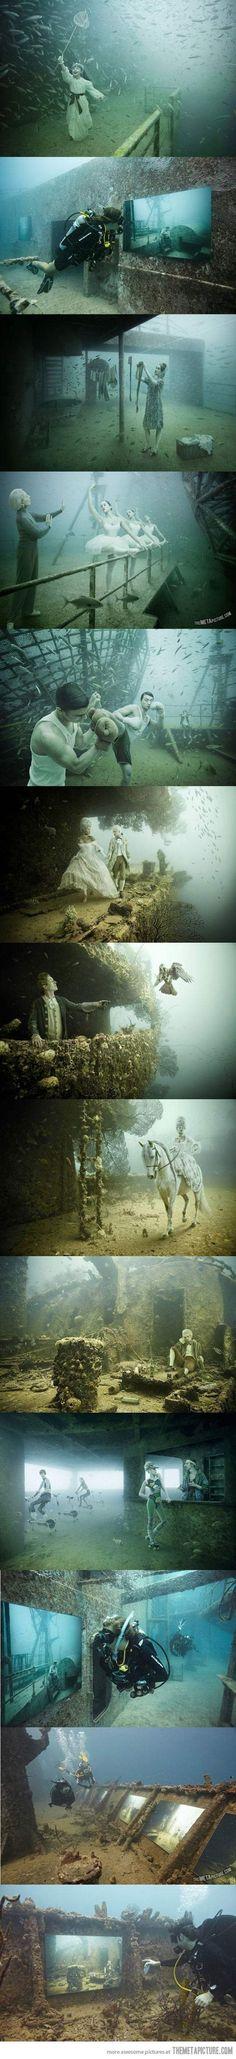 An amazing underwater museum… http://www.dreamtripsdepot.com